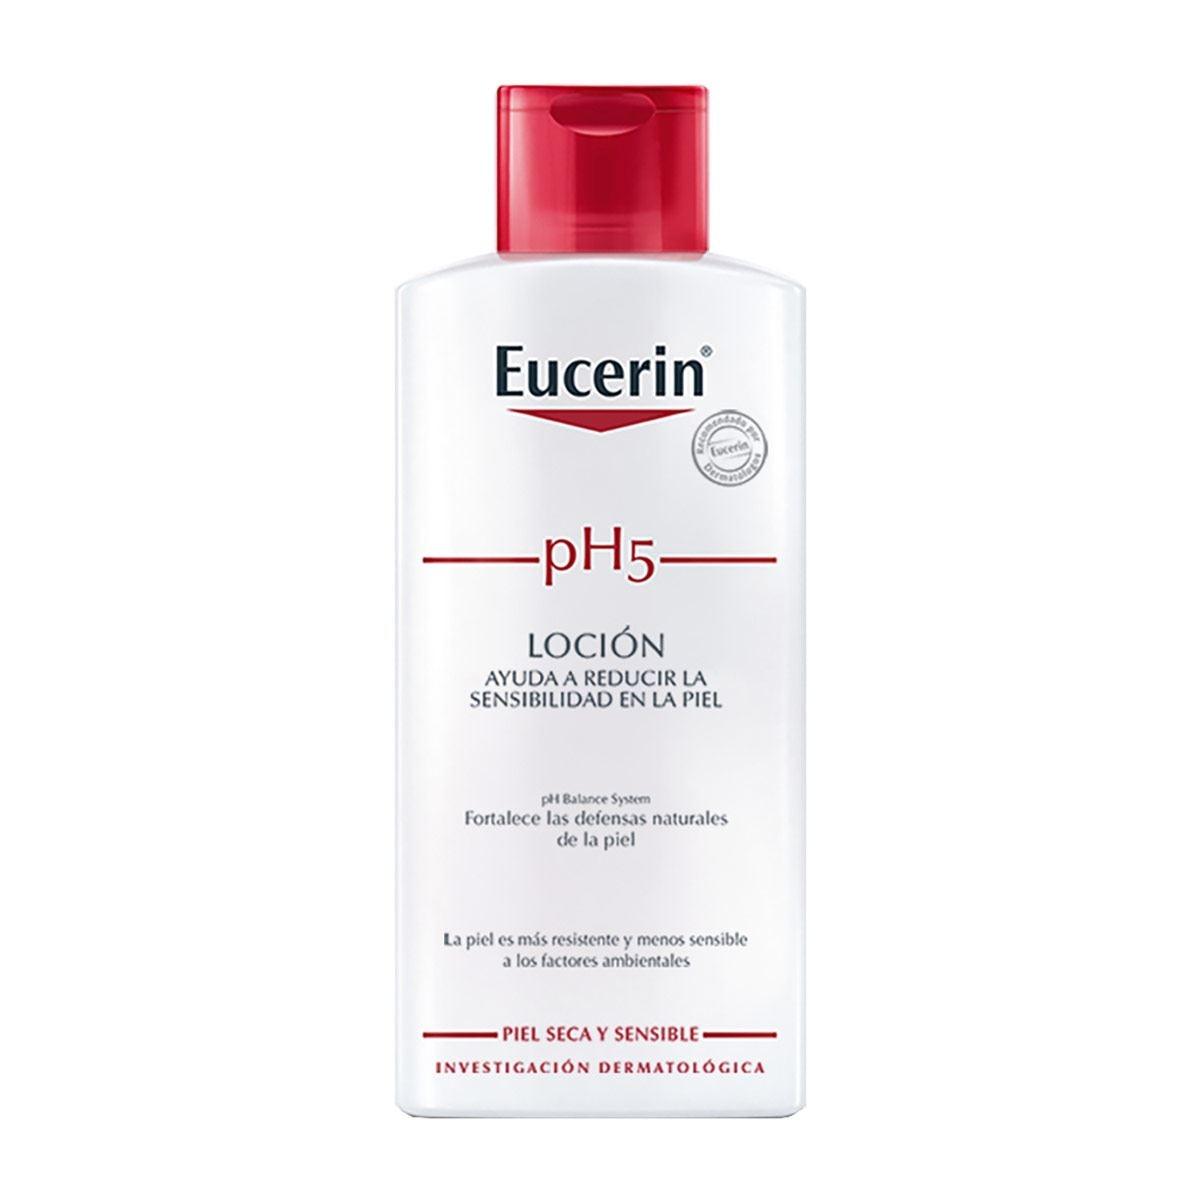 Eucerin, crema corporal ph5, 250ml  - Sanborns